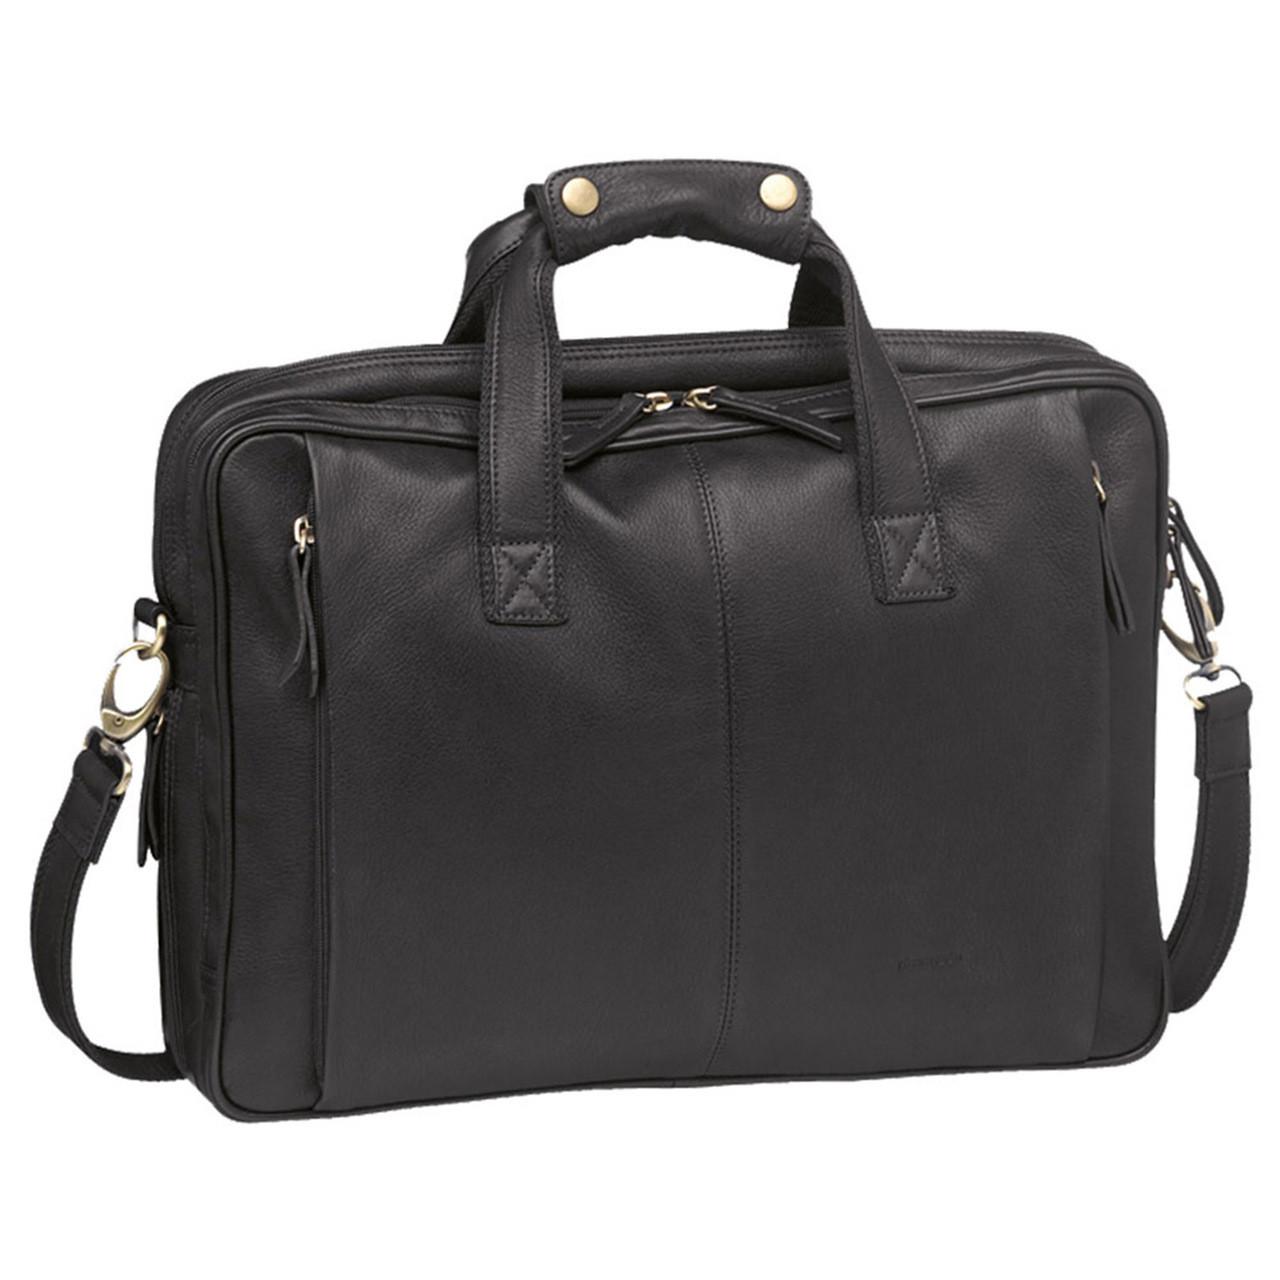 Pierre Cardin Unisex Black Laptop Computer Satchel Buy Bags Online At Orquestra